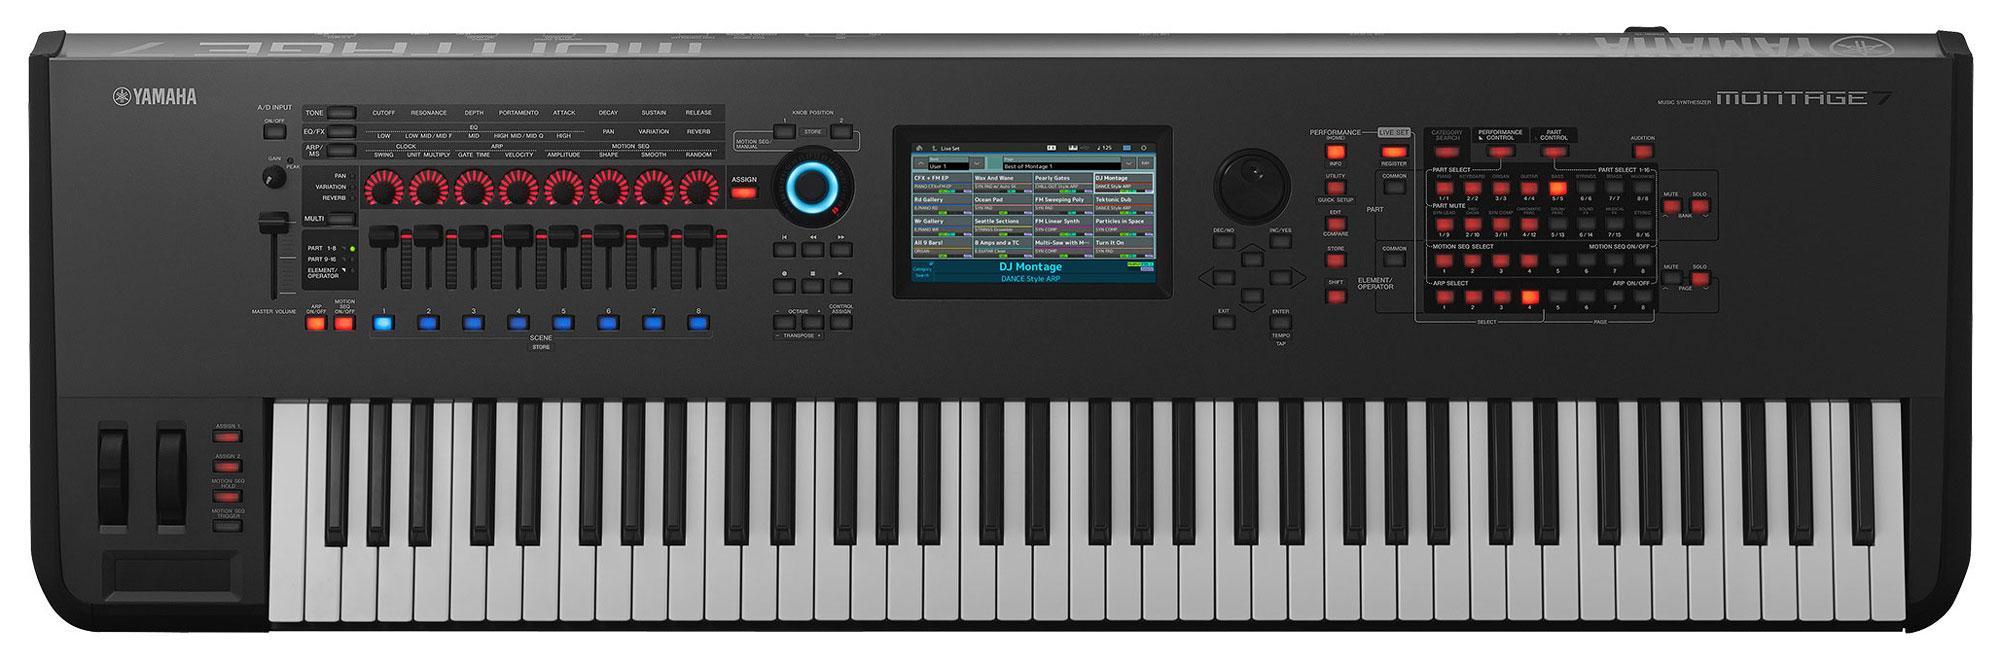 Synthesizer - Yamaha Montage 7 Synthesizer 76 Tasten - Onlineshop Musikhaus Kirstein